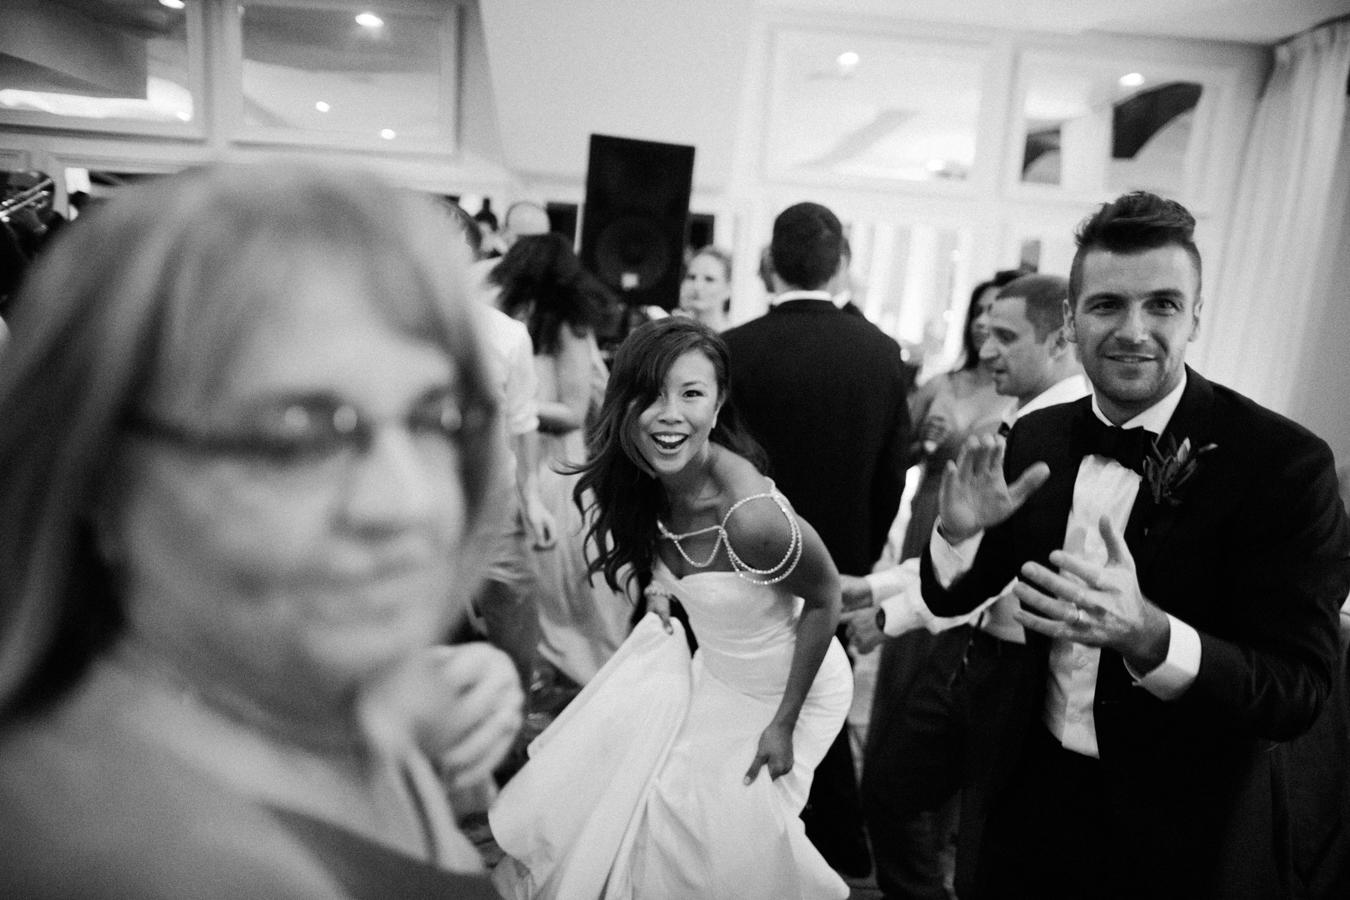 825_Jake+Kathryn_Brumley & Wells_Fine_Art_Film_Photography_Newport_Wedding.jpg